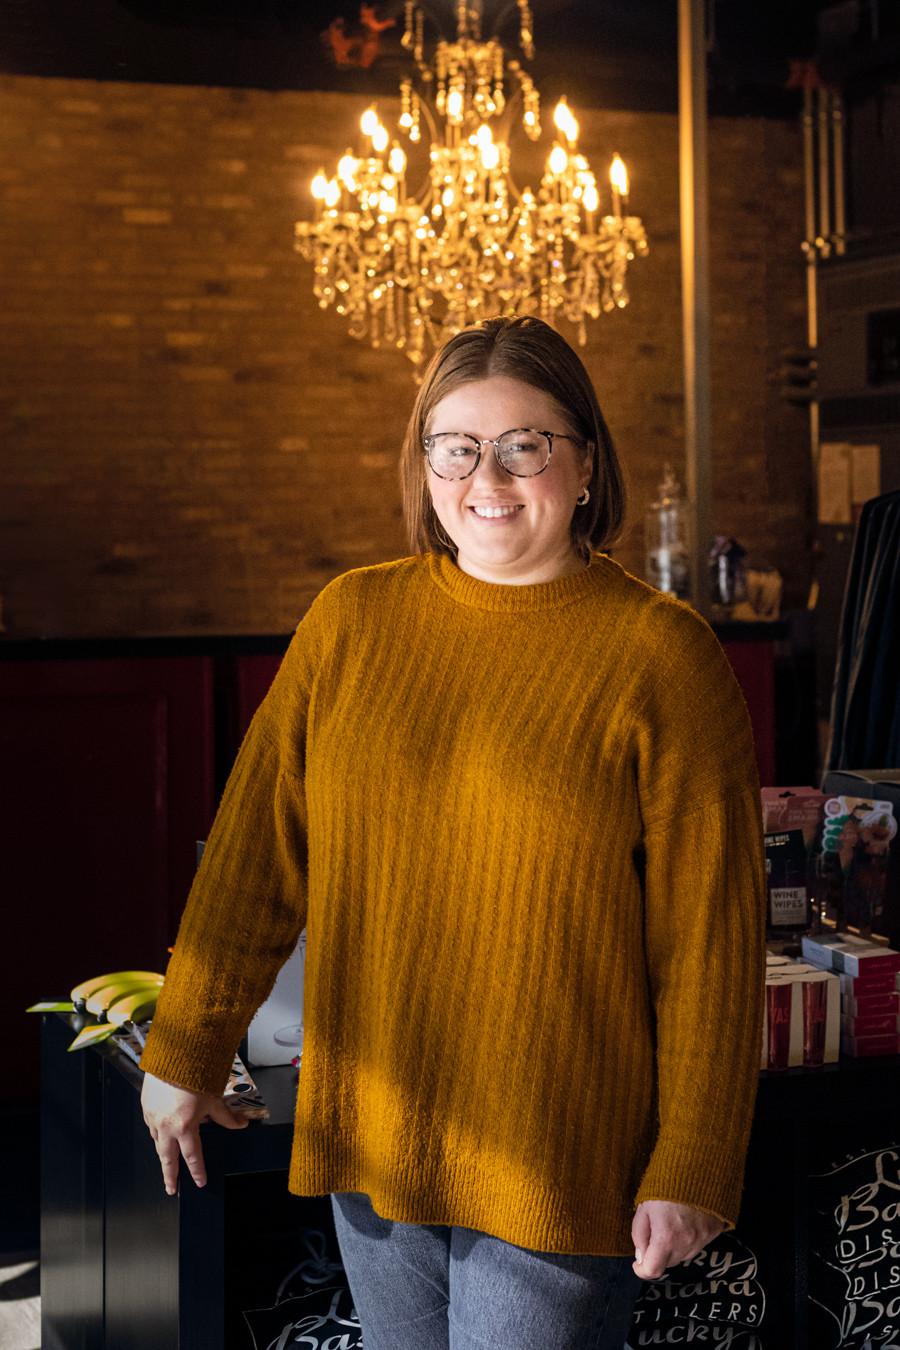 Portrait of Deandra Bailey, Chief Brand Officer at Lucky Bastard Distillers in Saskatoon.